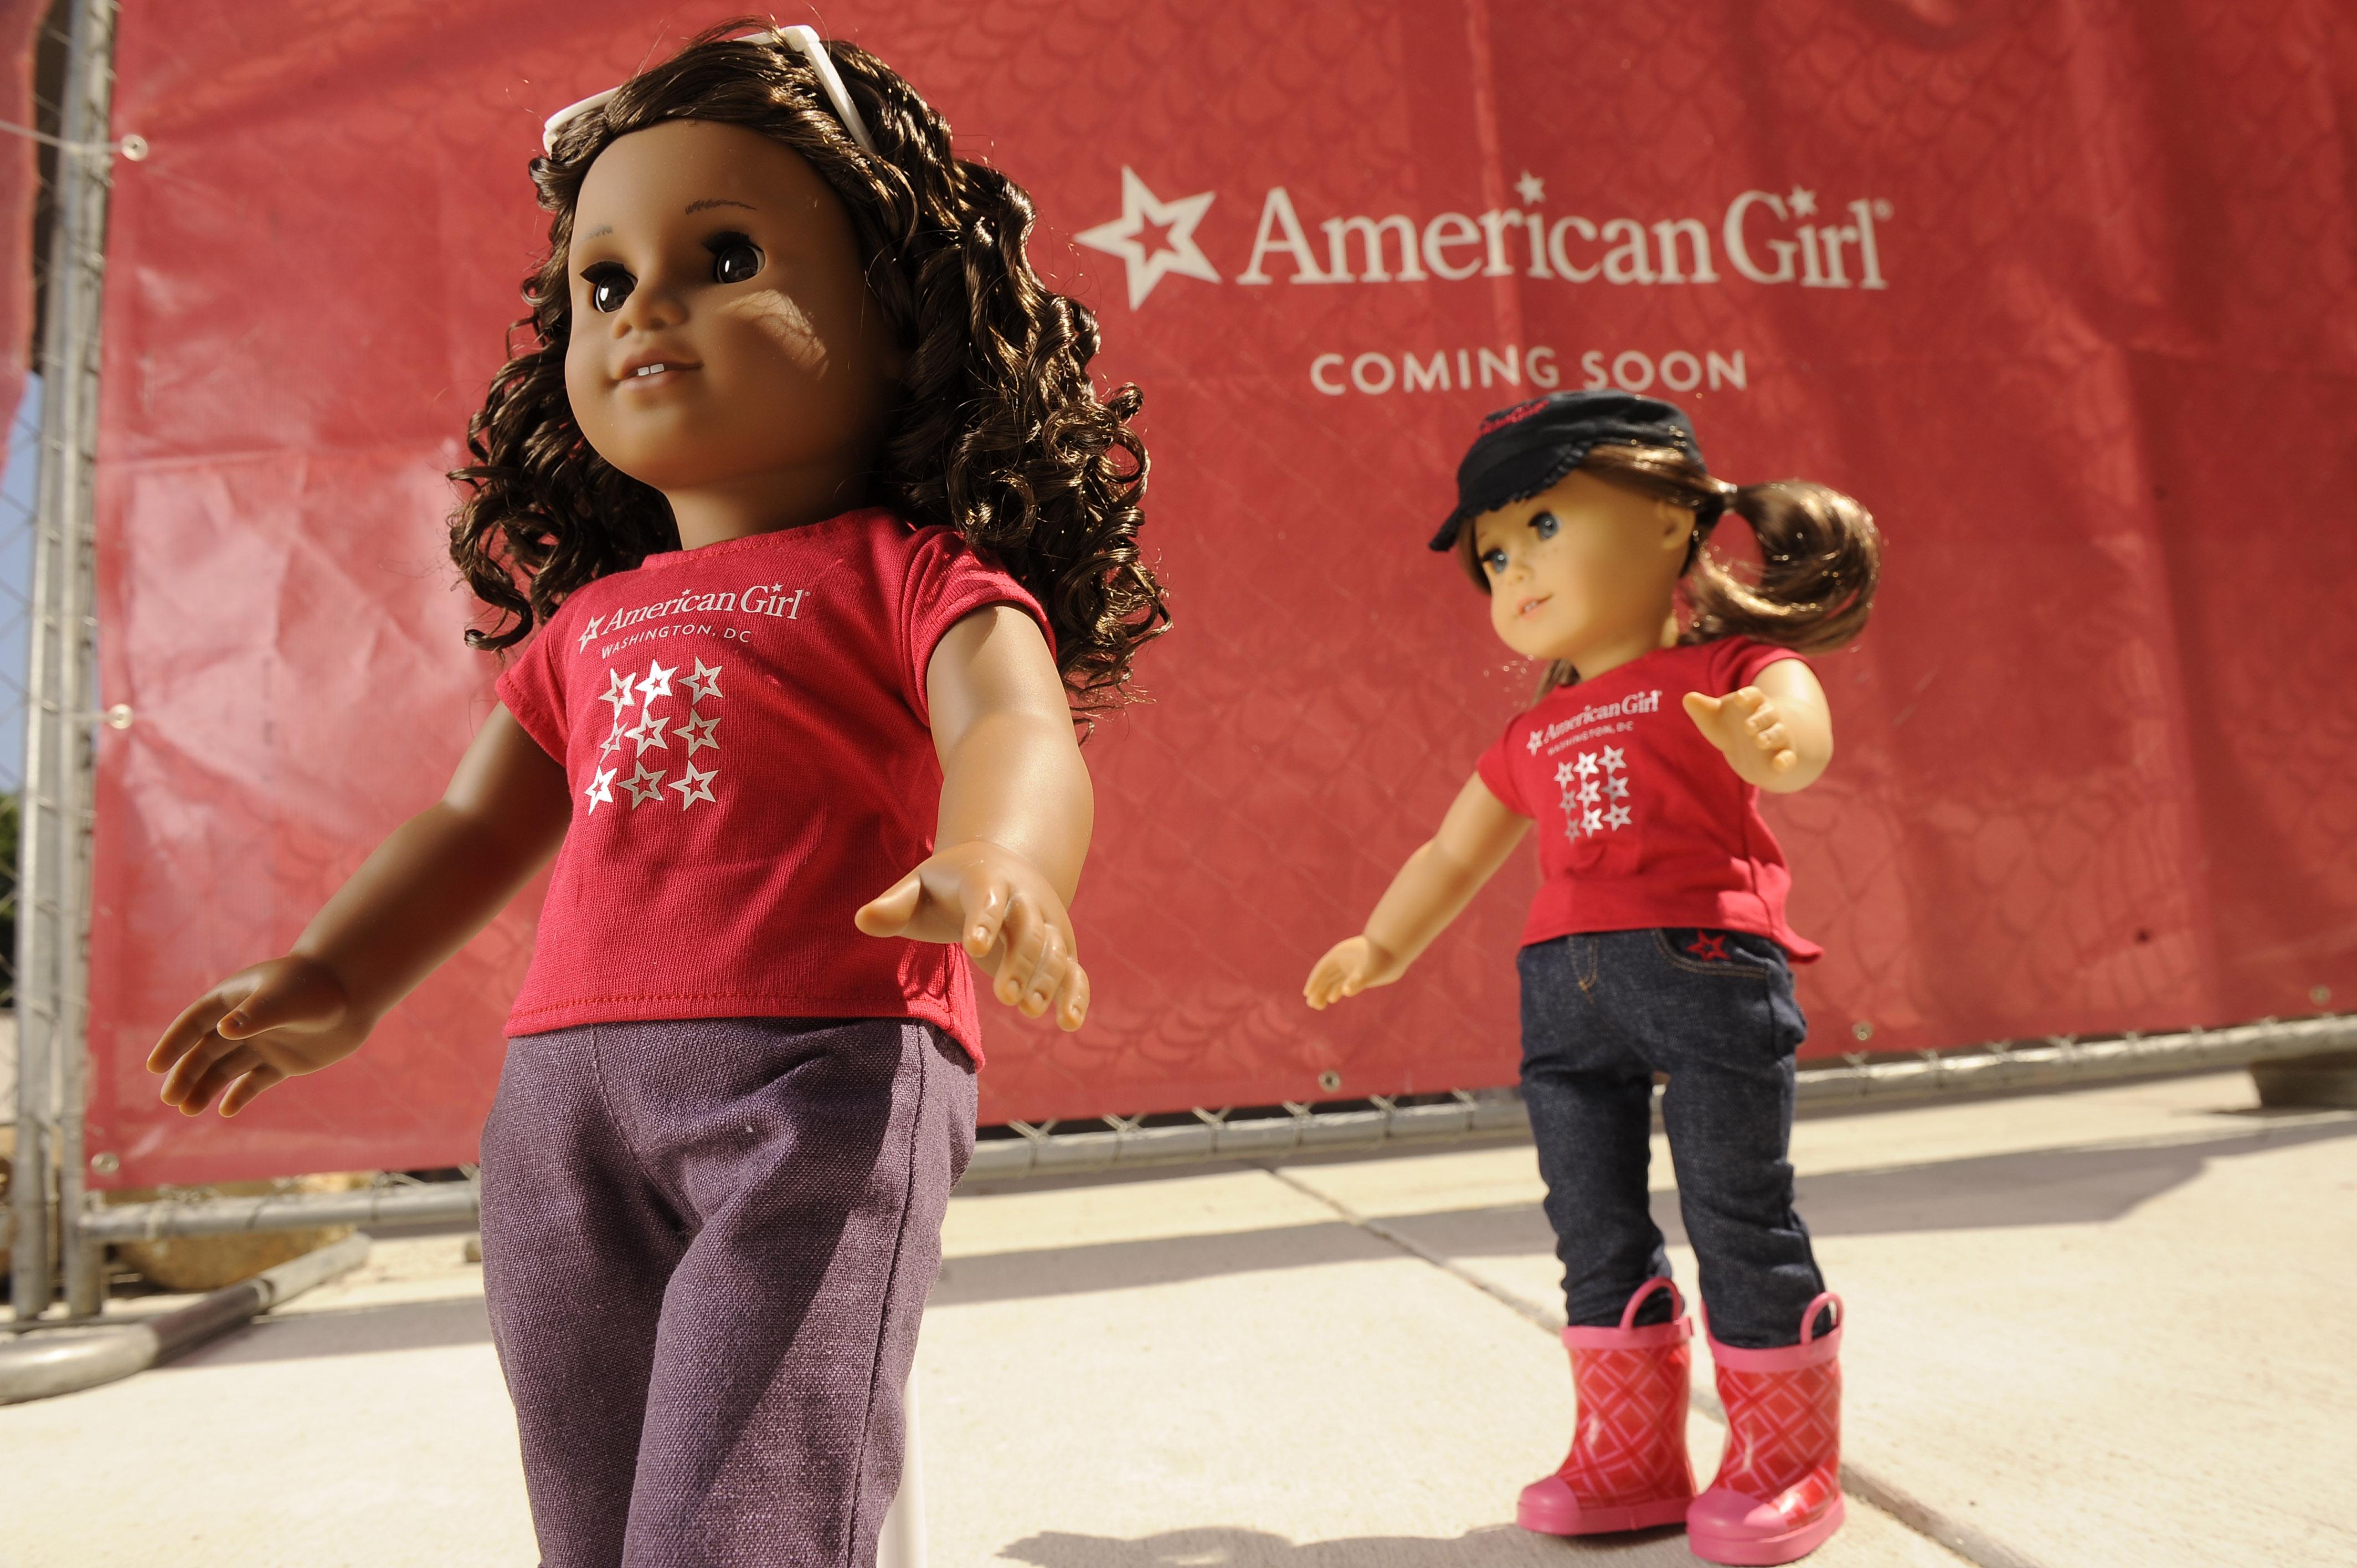 american girl price